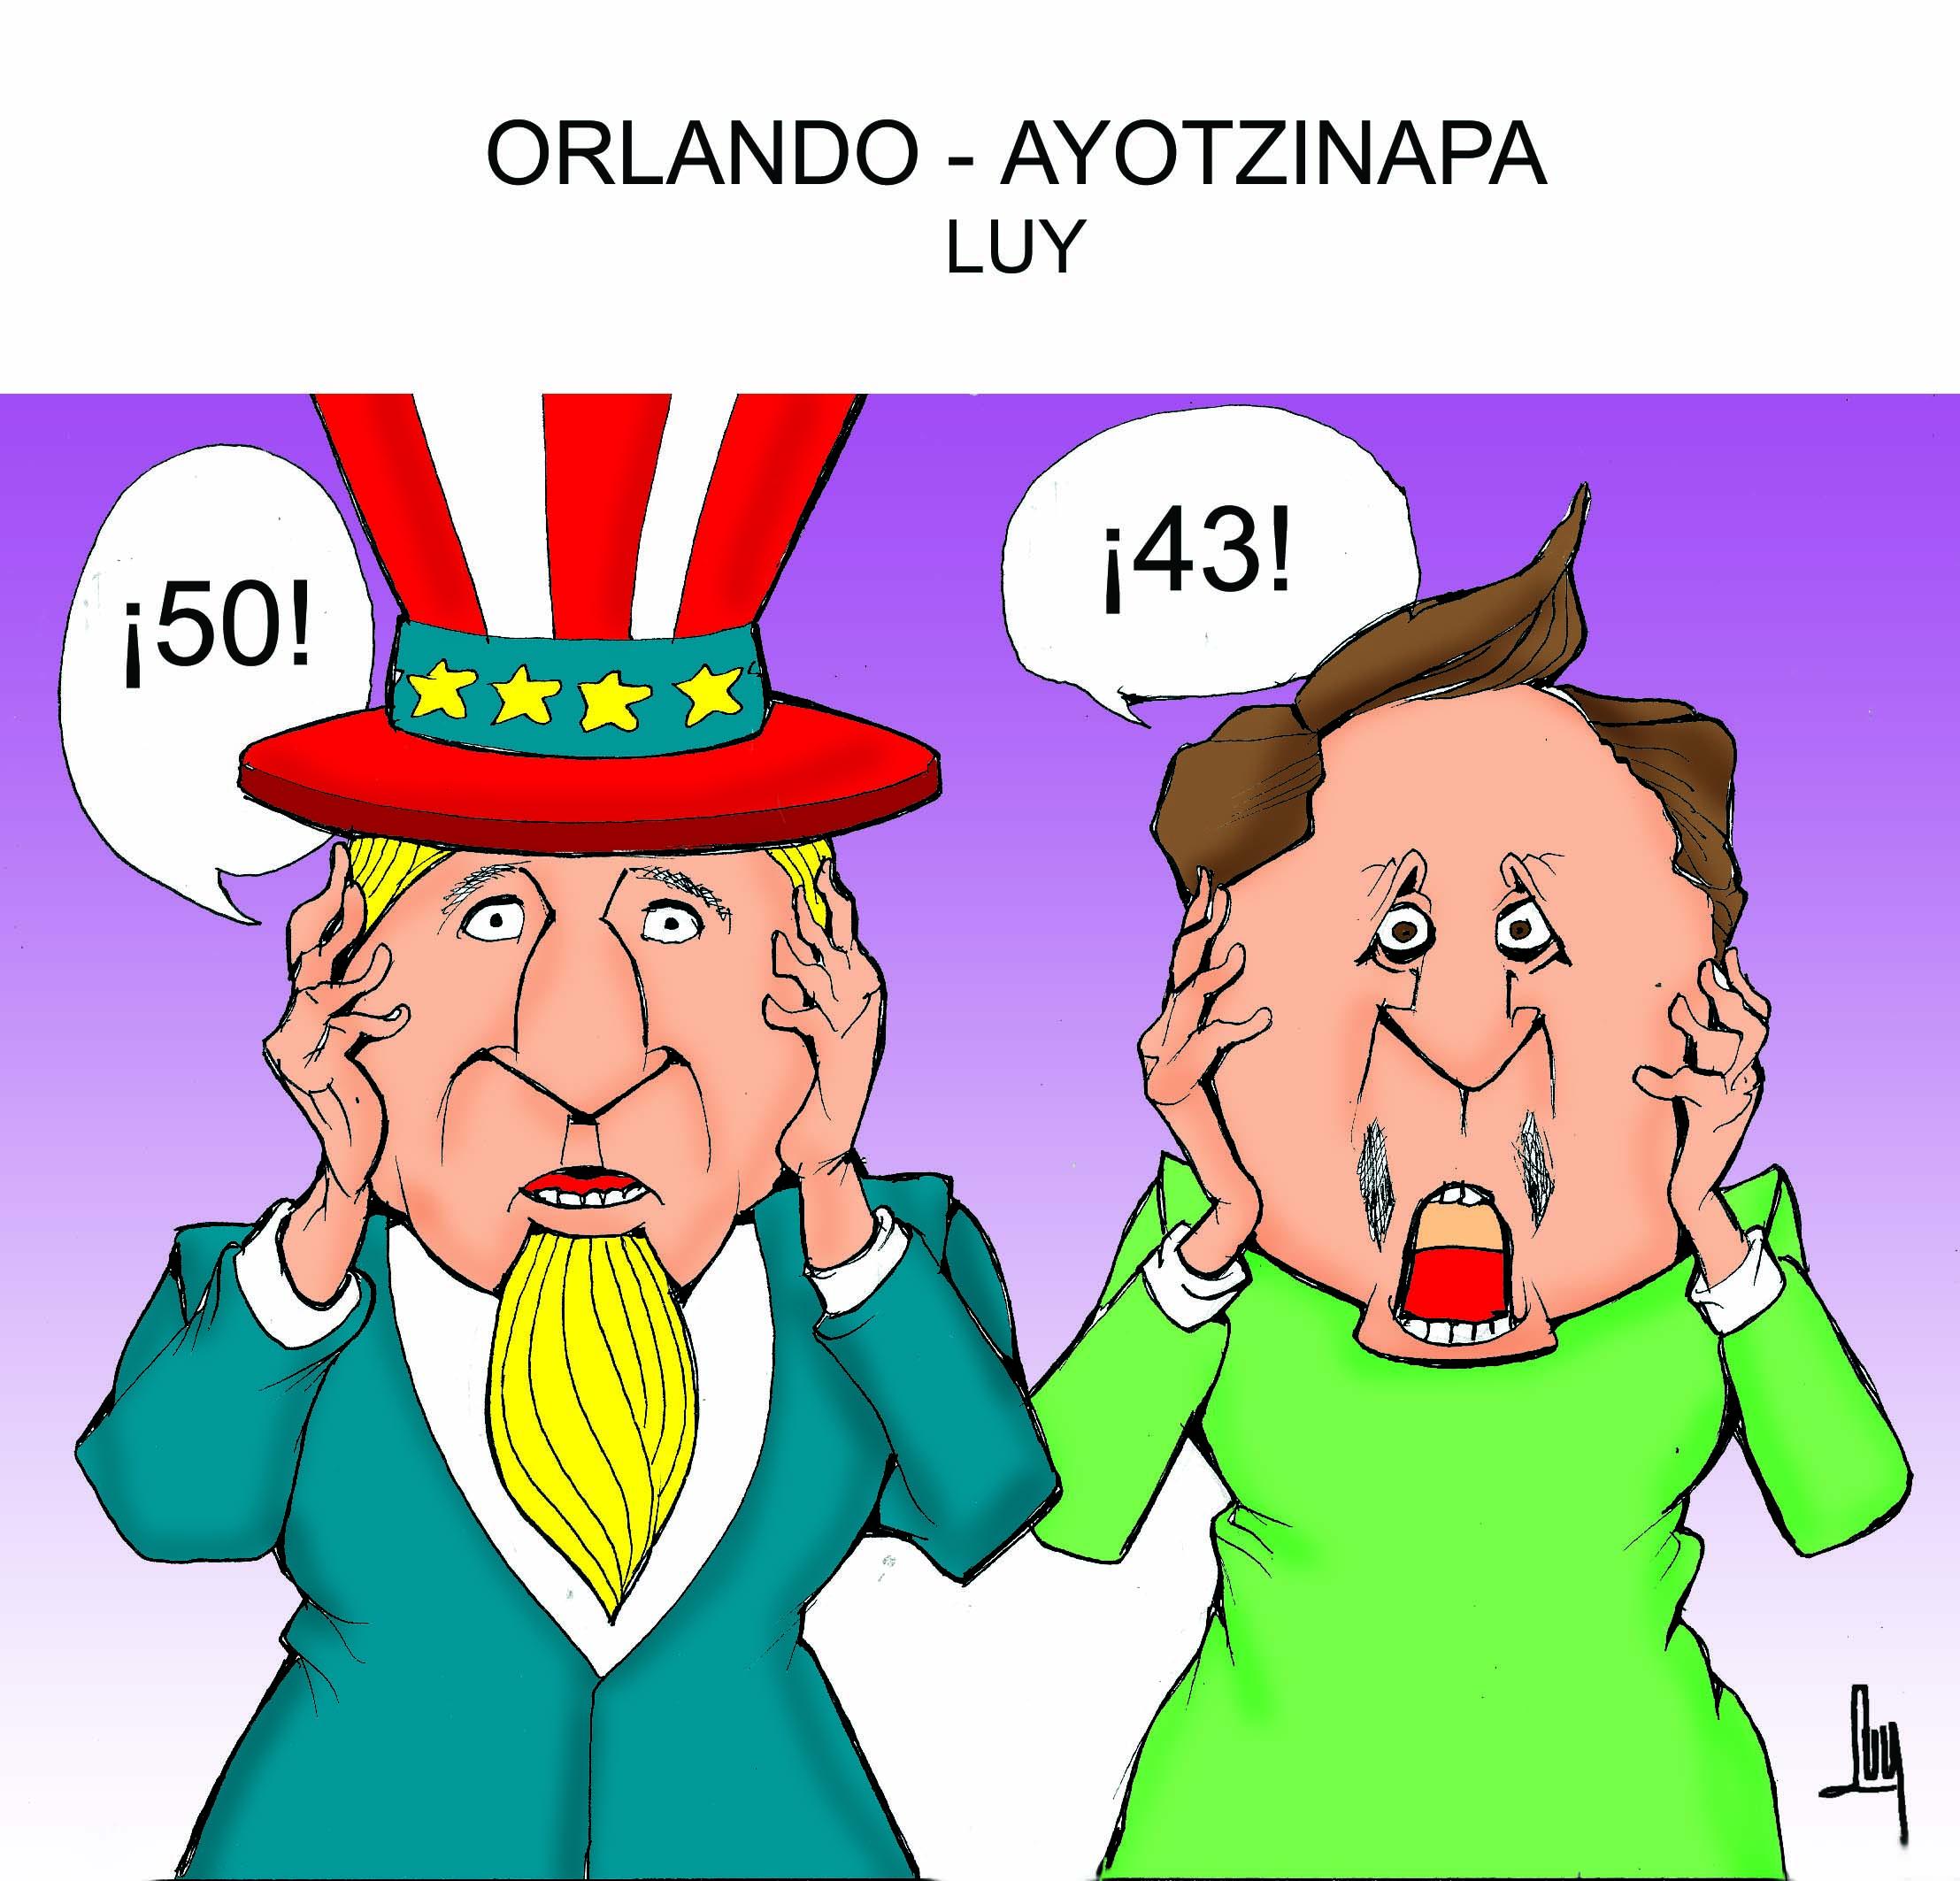 orlando-ayotzinapa